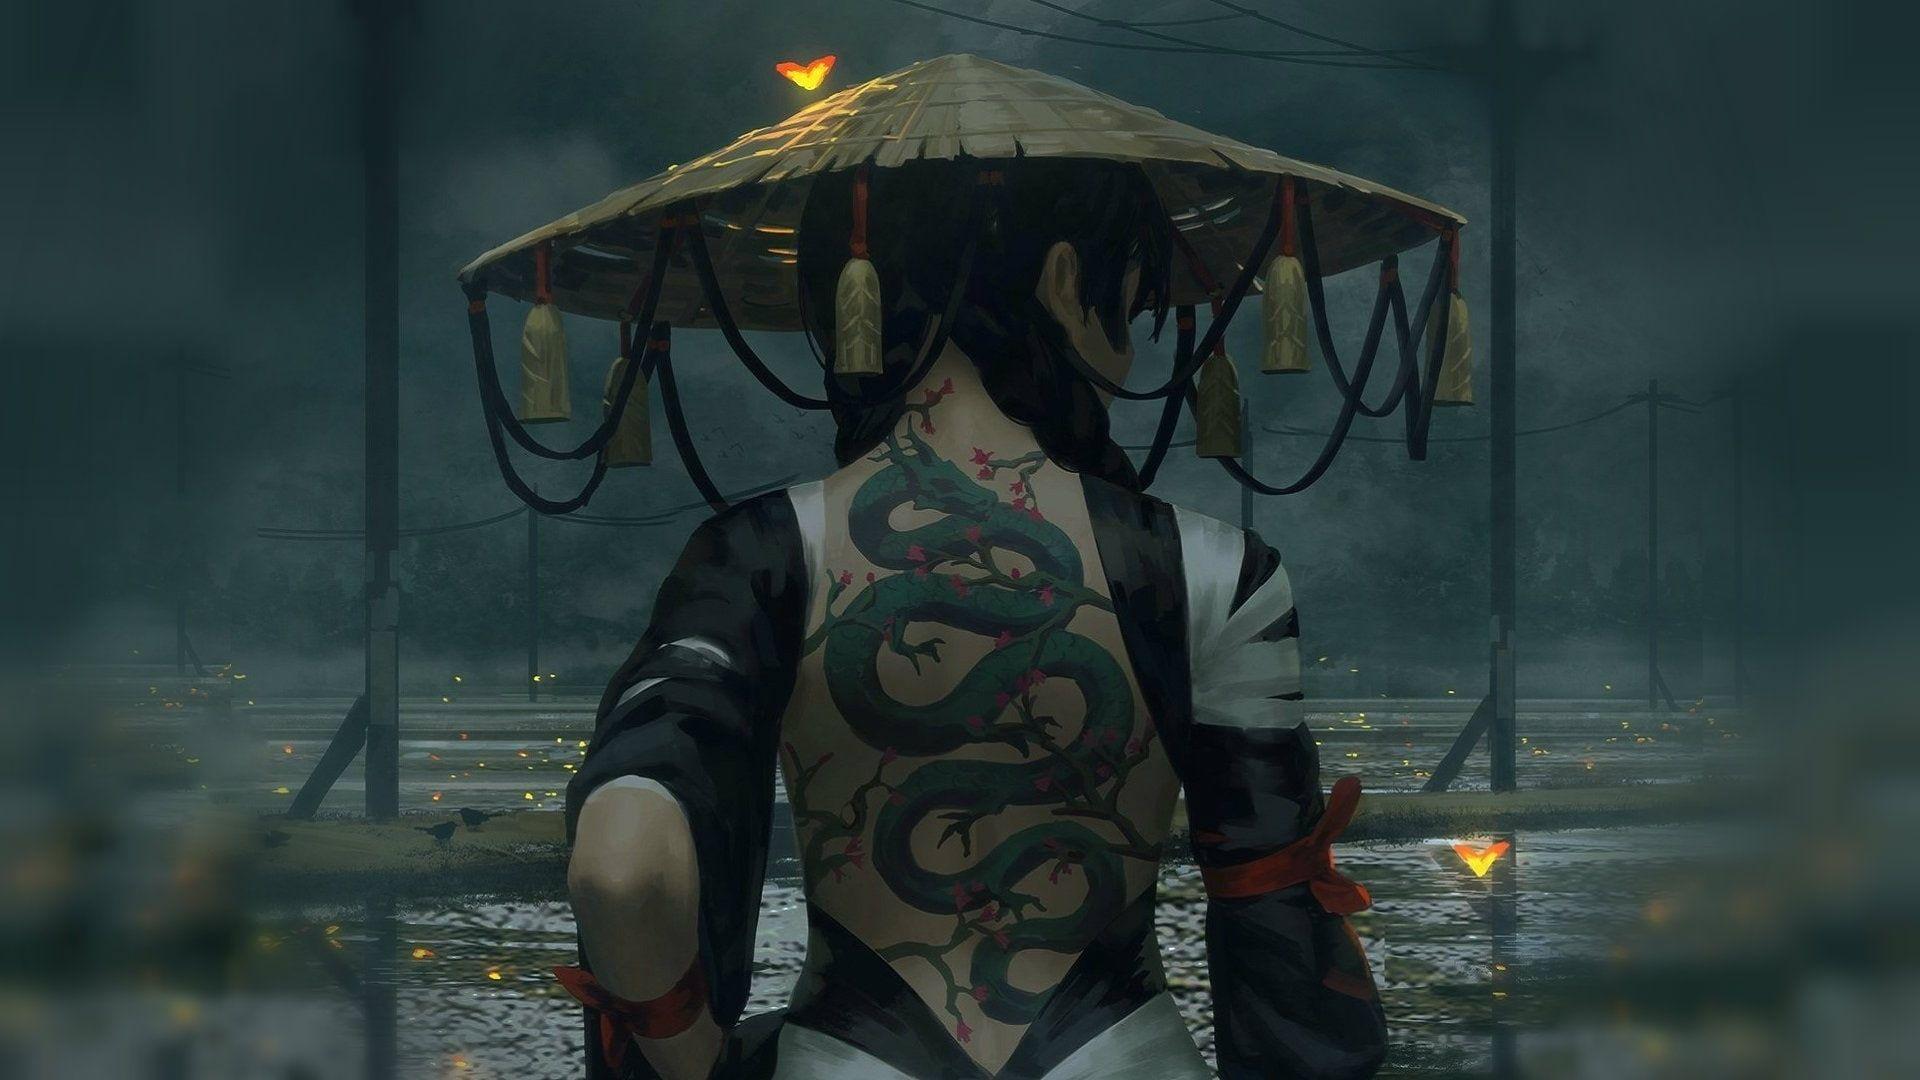 Guweiz Tattoo Hat Back Women Warrior Fantasy Girl Dragon Z W Gu Asia Artwork Fantasy Art 1080p Wallpaper Hdwallp Fantasy Girl Hd Wallpaper Fantasy Tattoo wallpaper hd 1080p